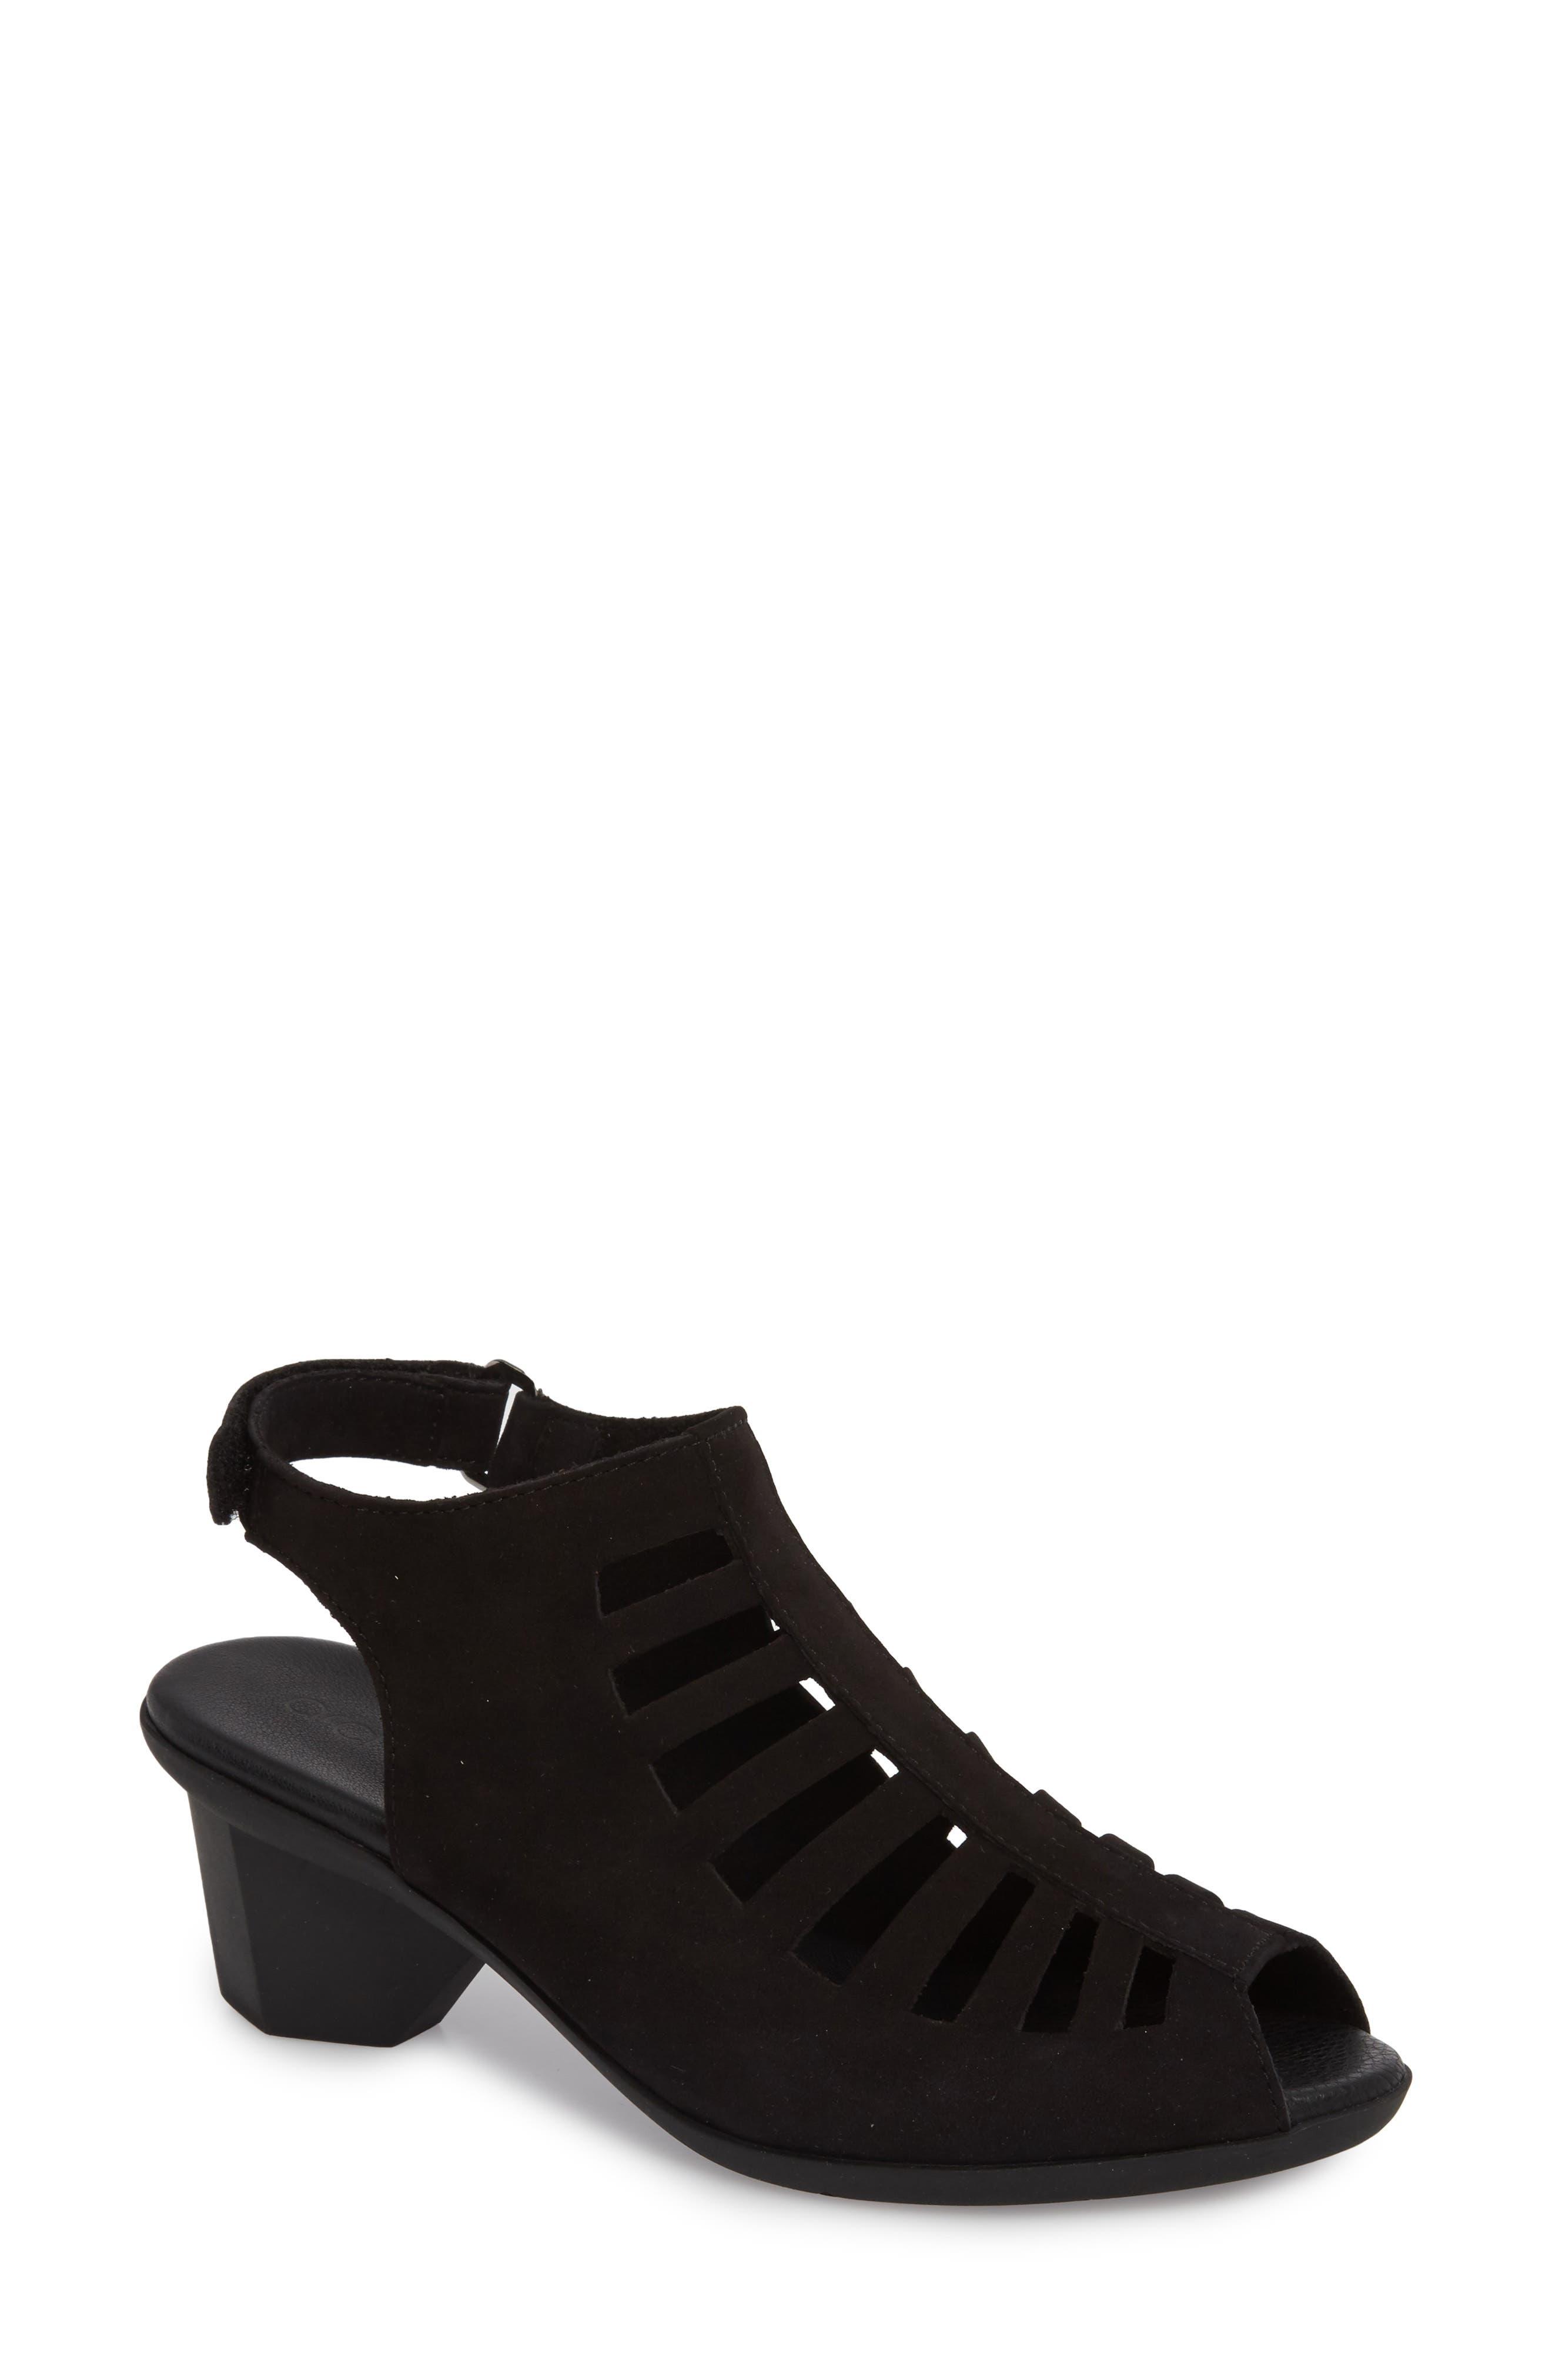 Enexor Sandal,                         Main,                         color, NOIR NUBUCK